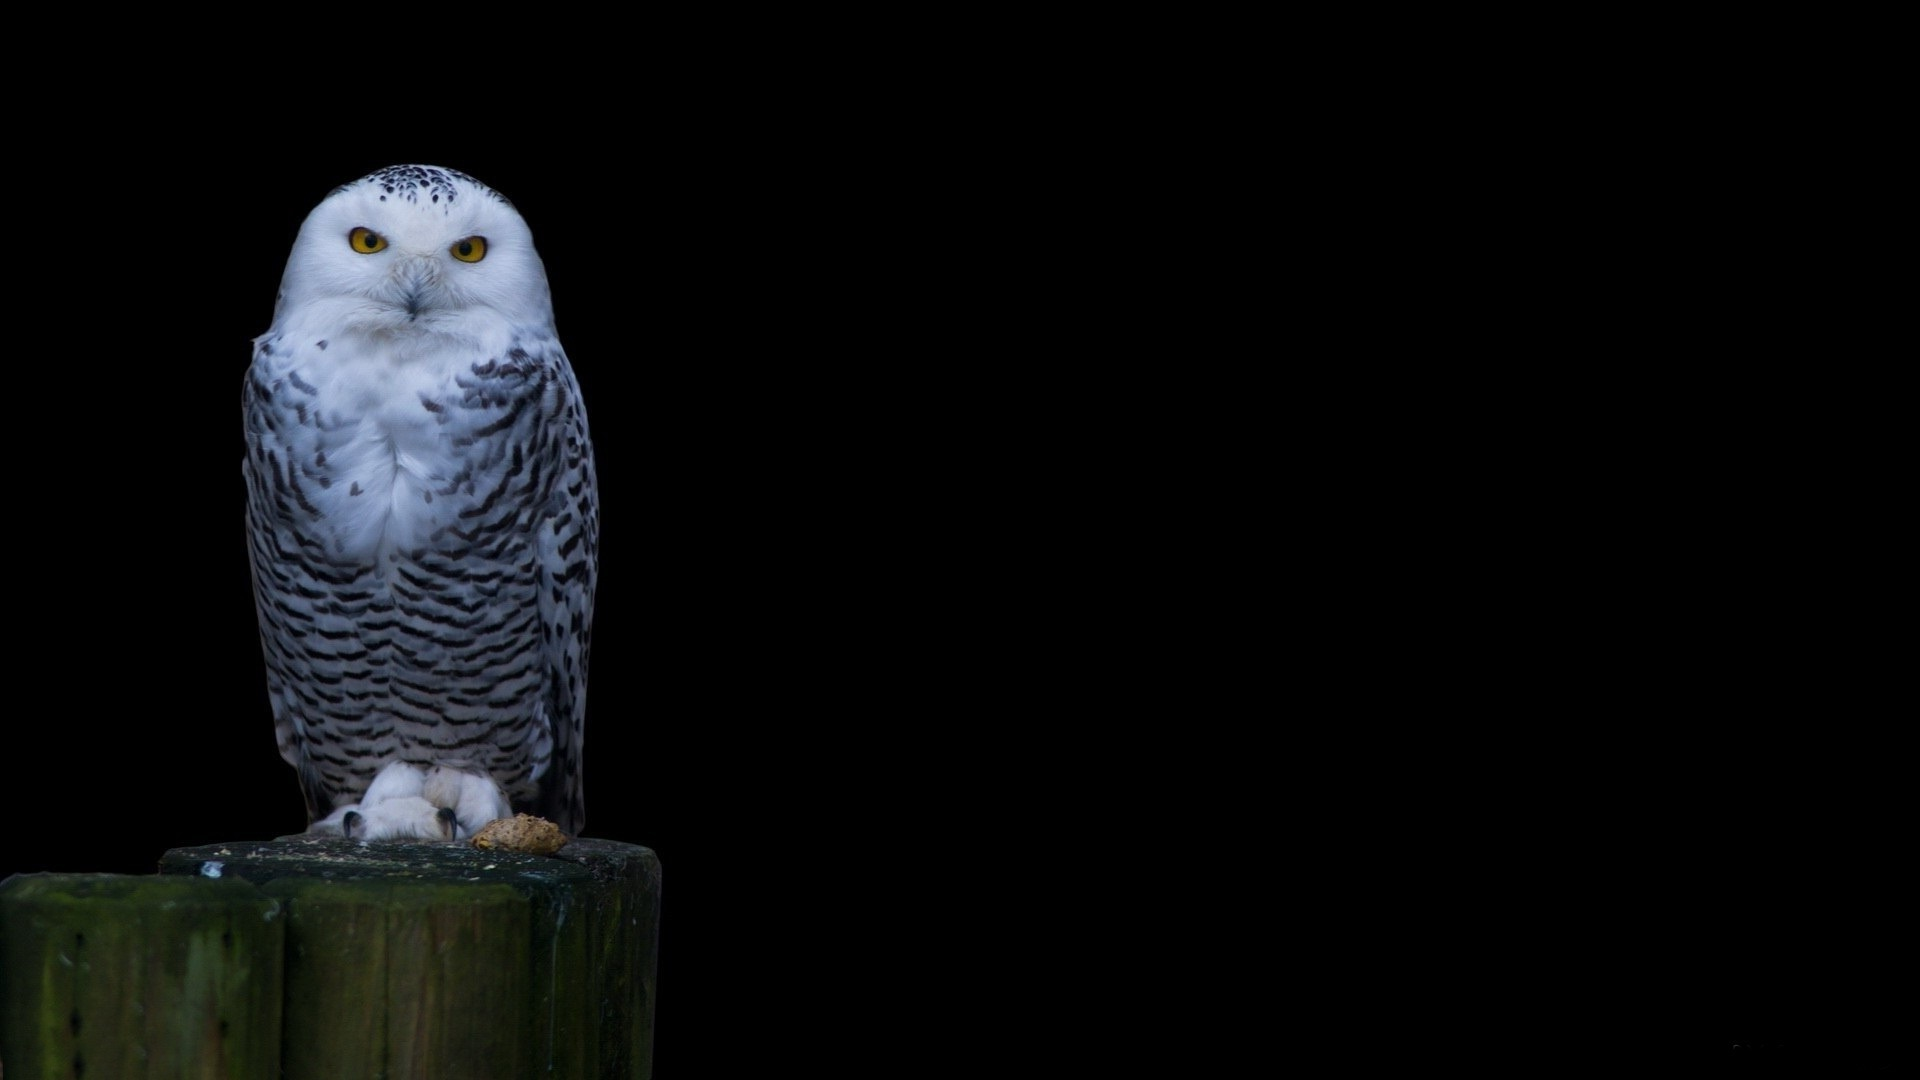 Owl Wallpaper Hd Download White Head Owl Wallpaper Snowy Owl 115282 Hd Wallpaper Backgrounds Download